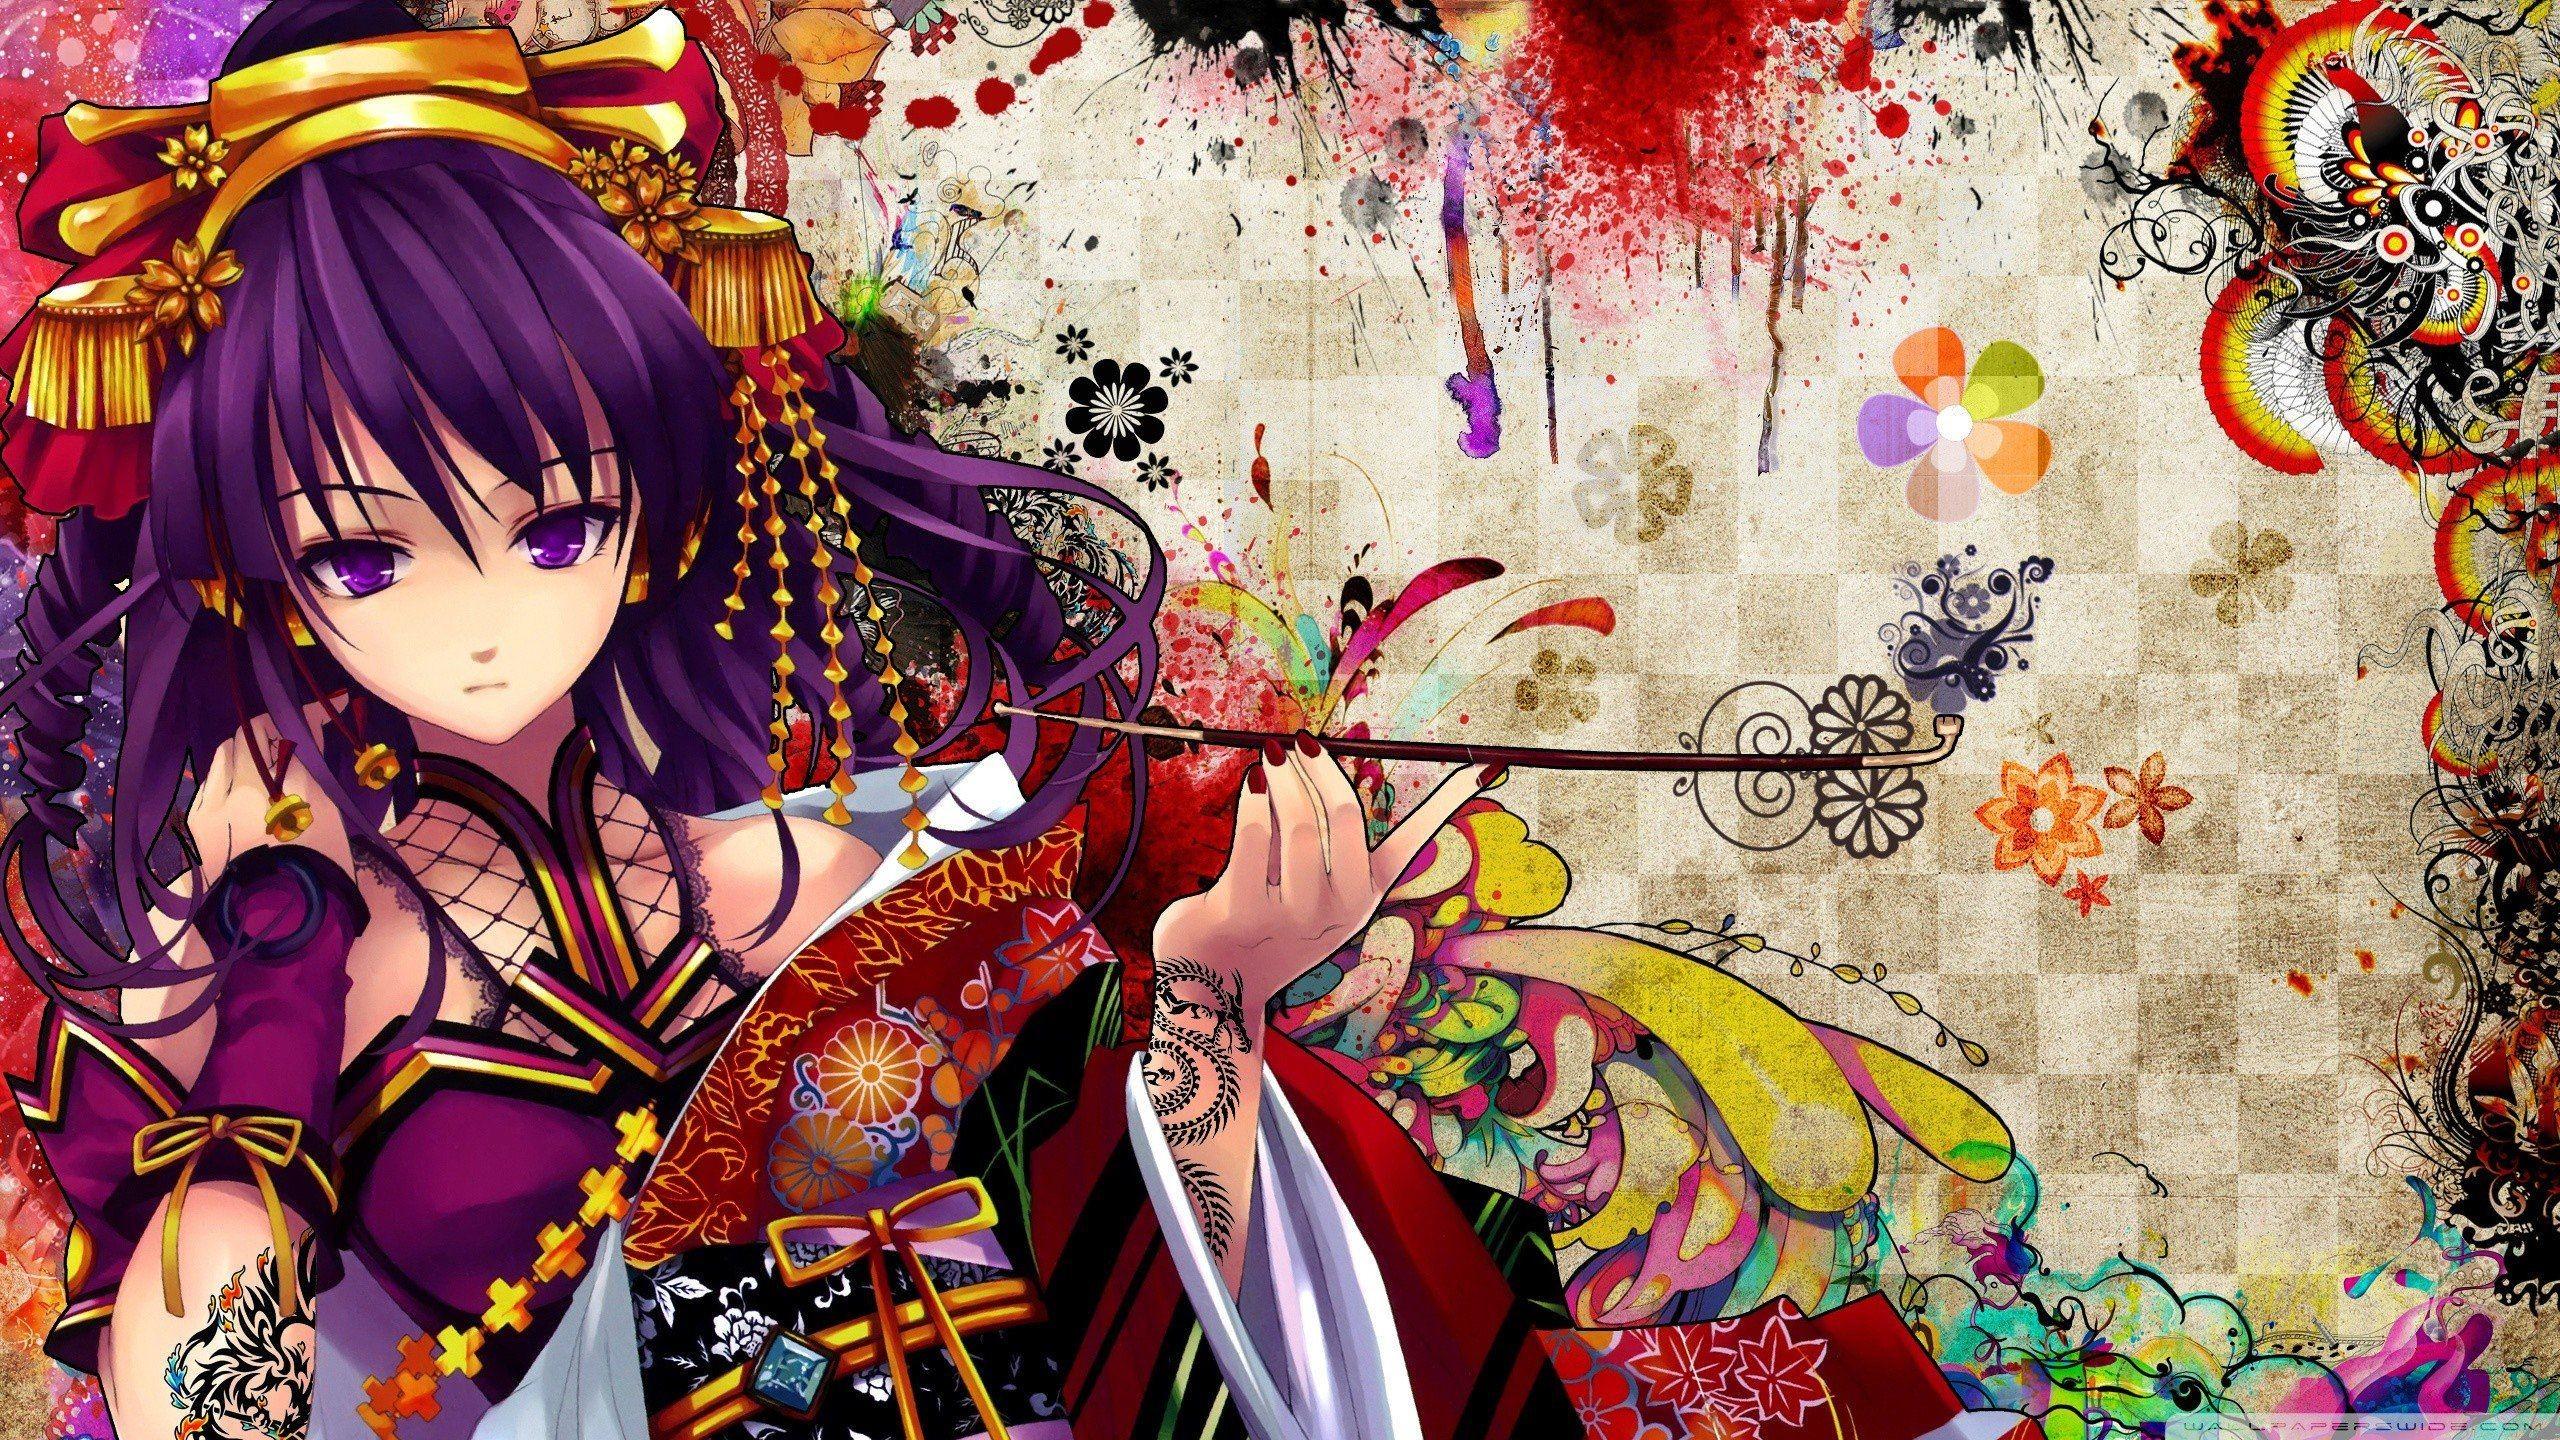 Anime Wallpaper Sexy Japan 2594912 Hd Wallpaper Backgrounds